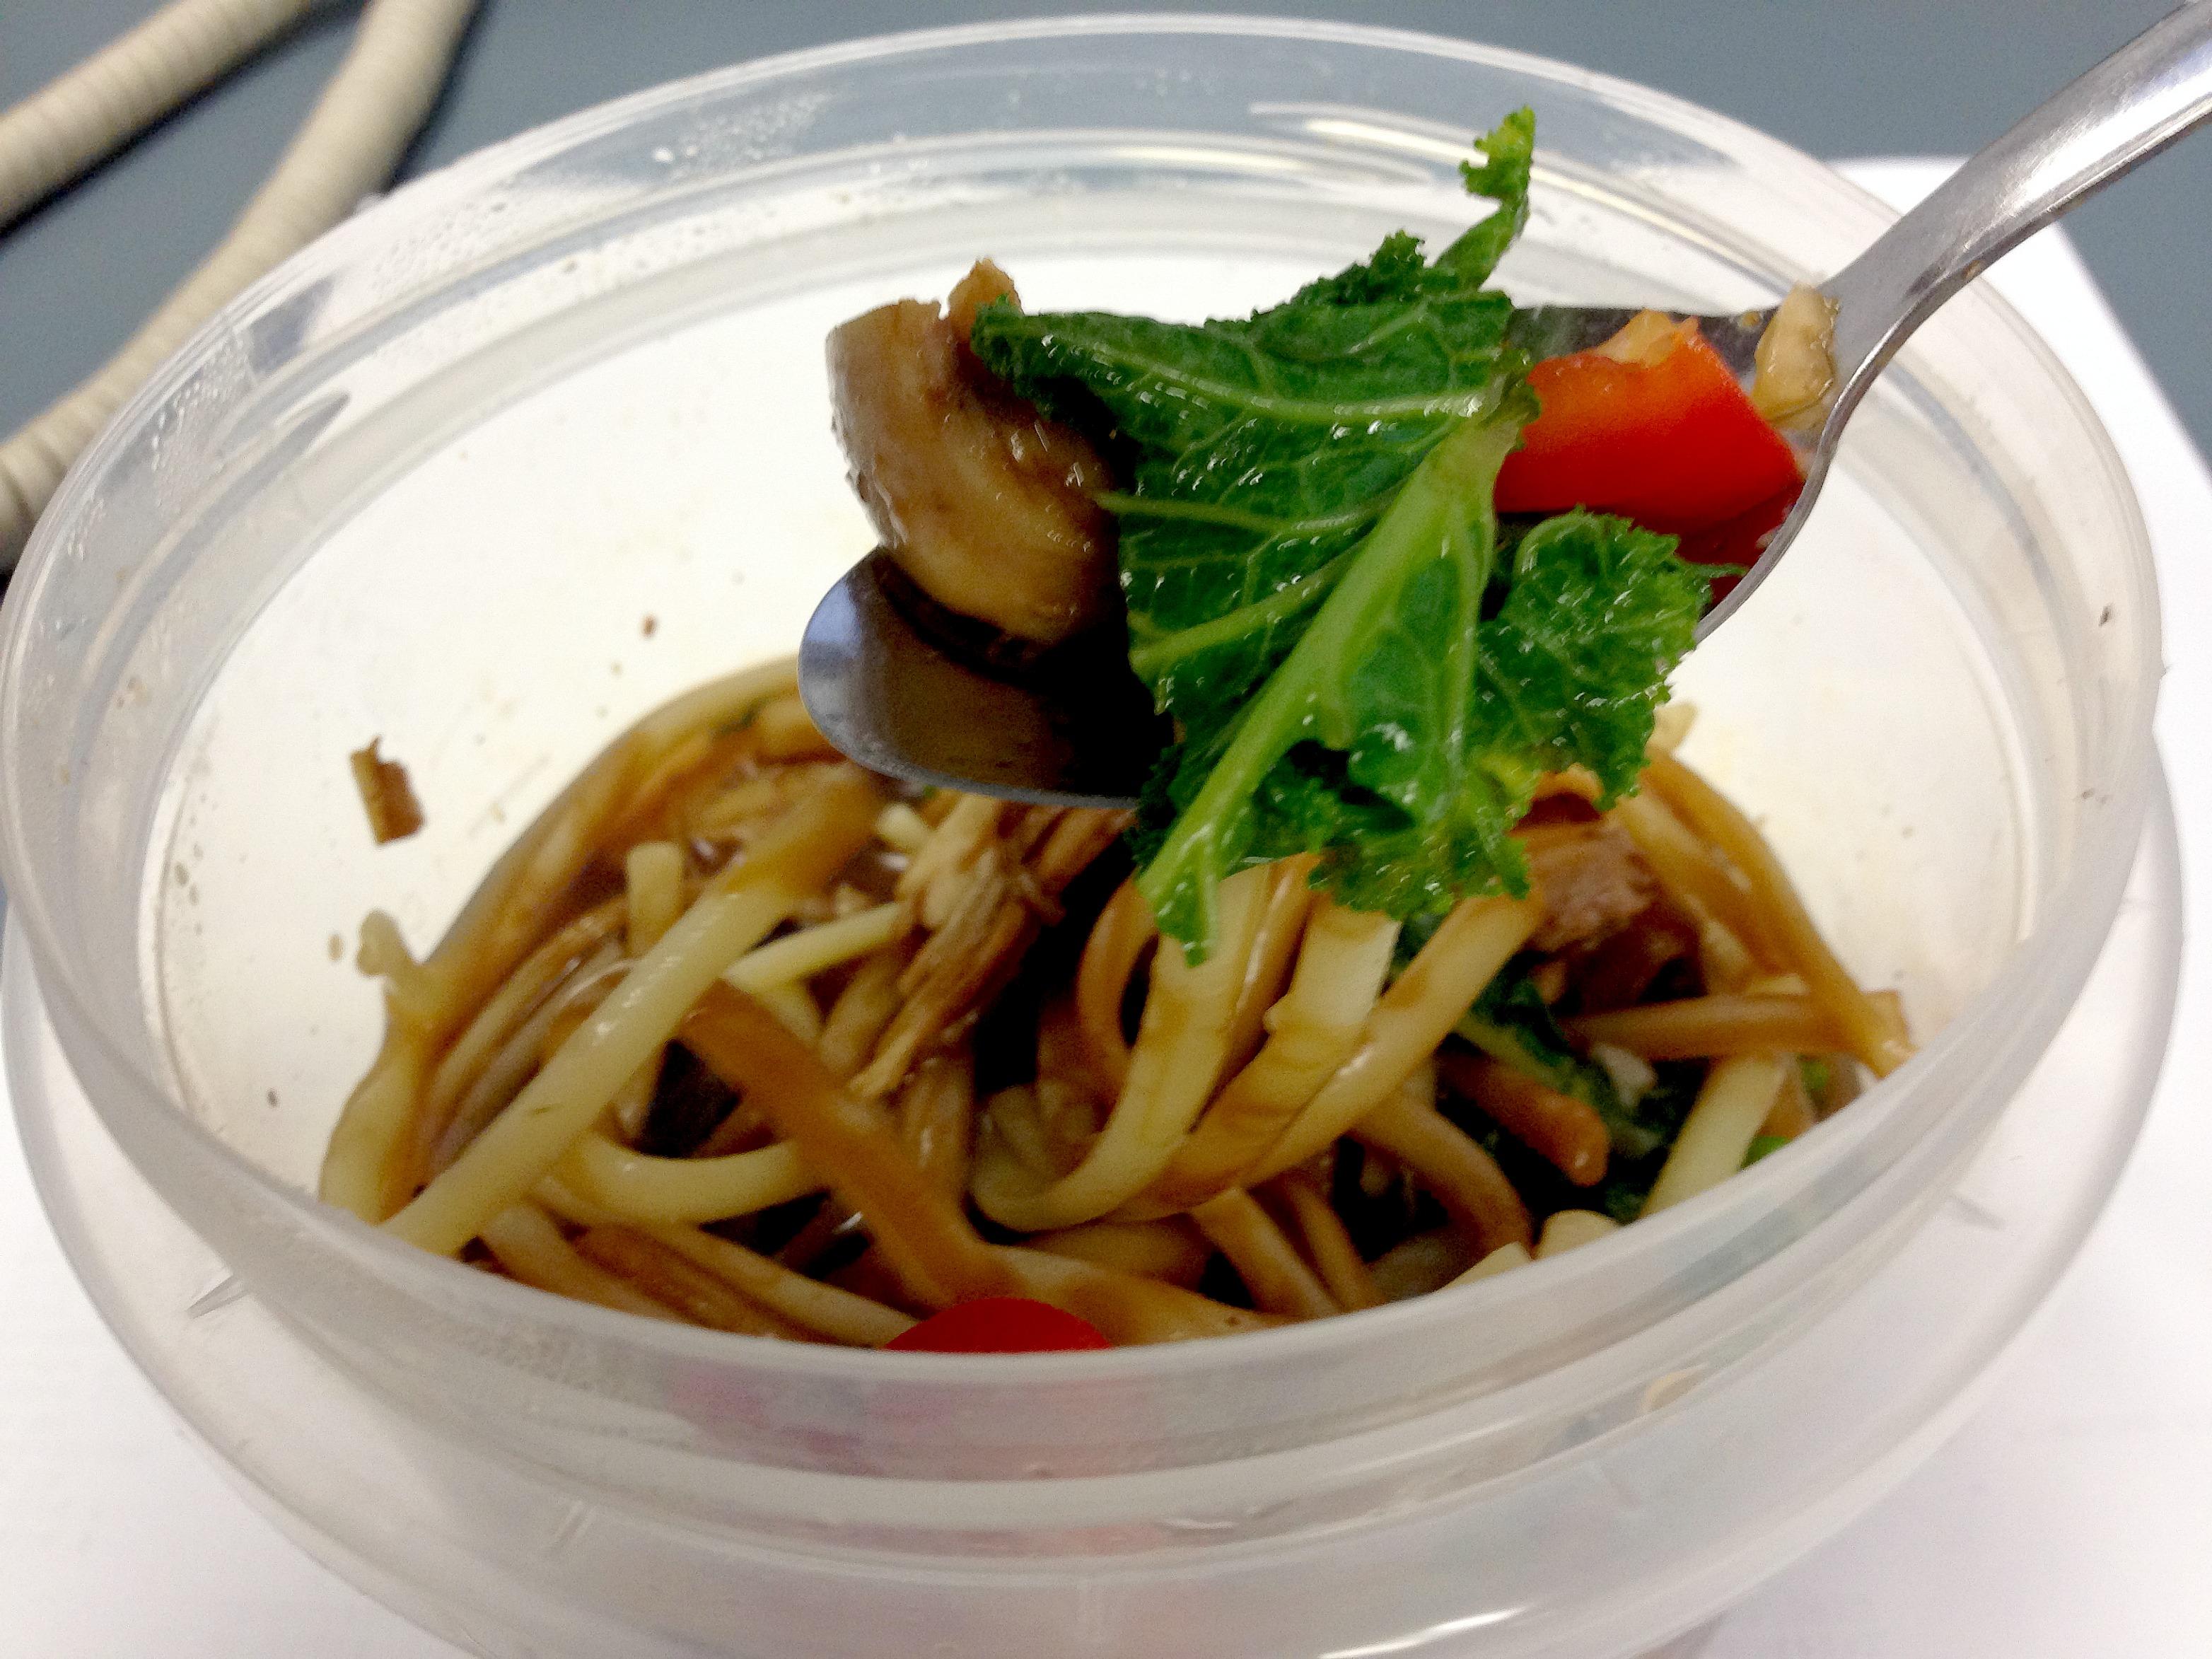 Homemade noodle bowl